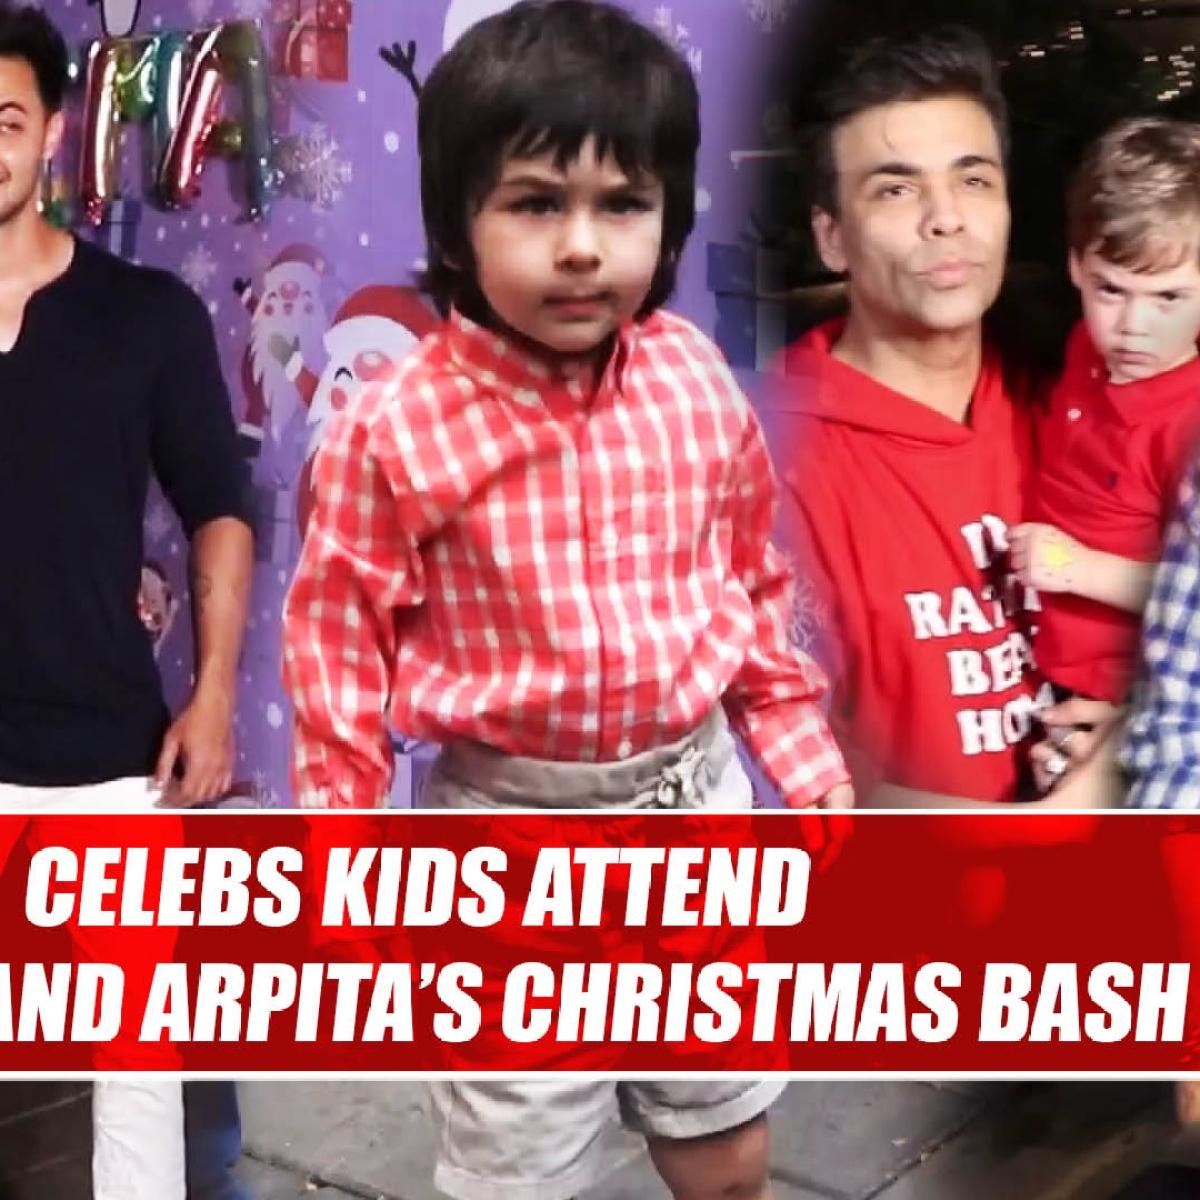 Salman khan, Ritesh, Karan Johar and many others attend Aayush and Arpita's Christmas bash